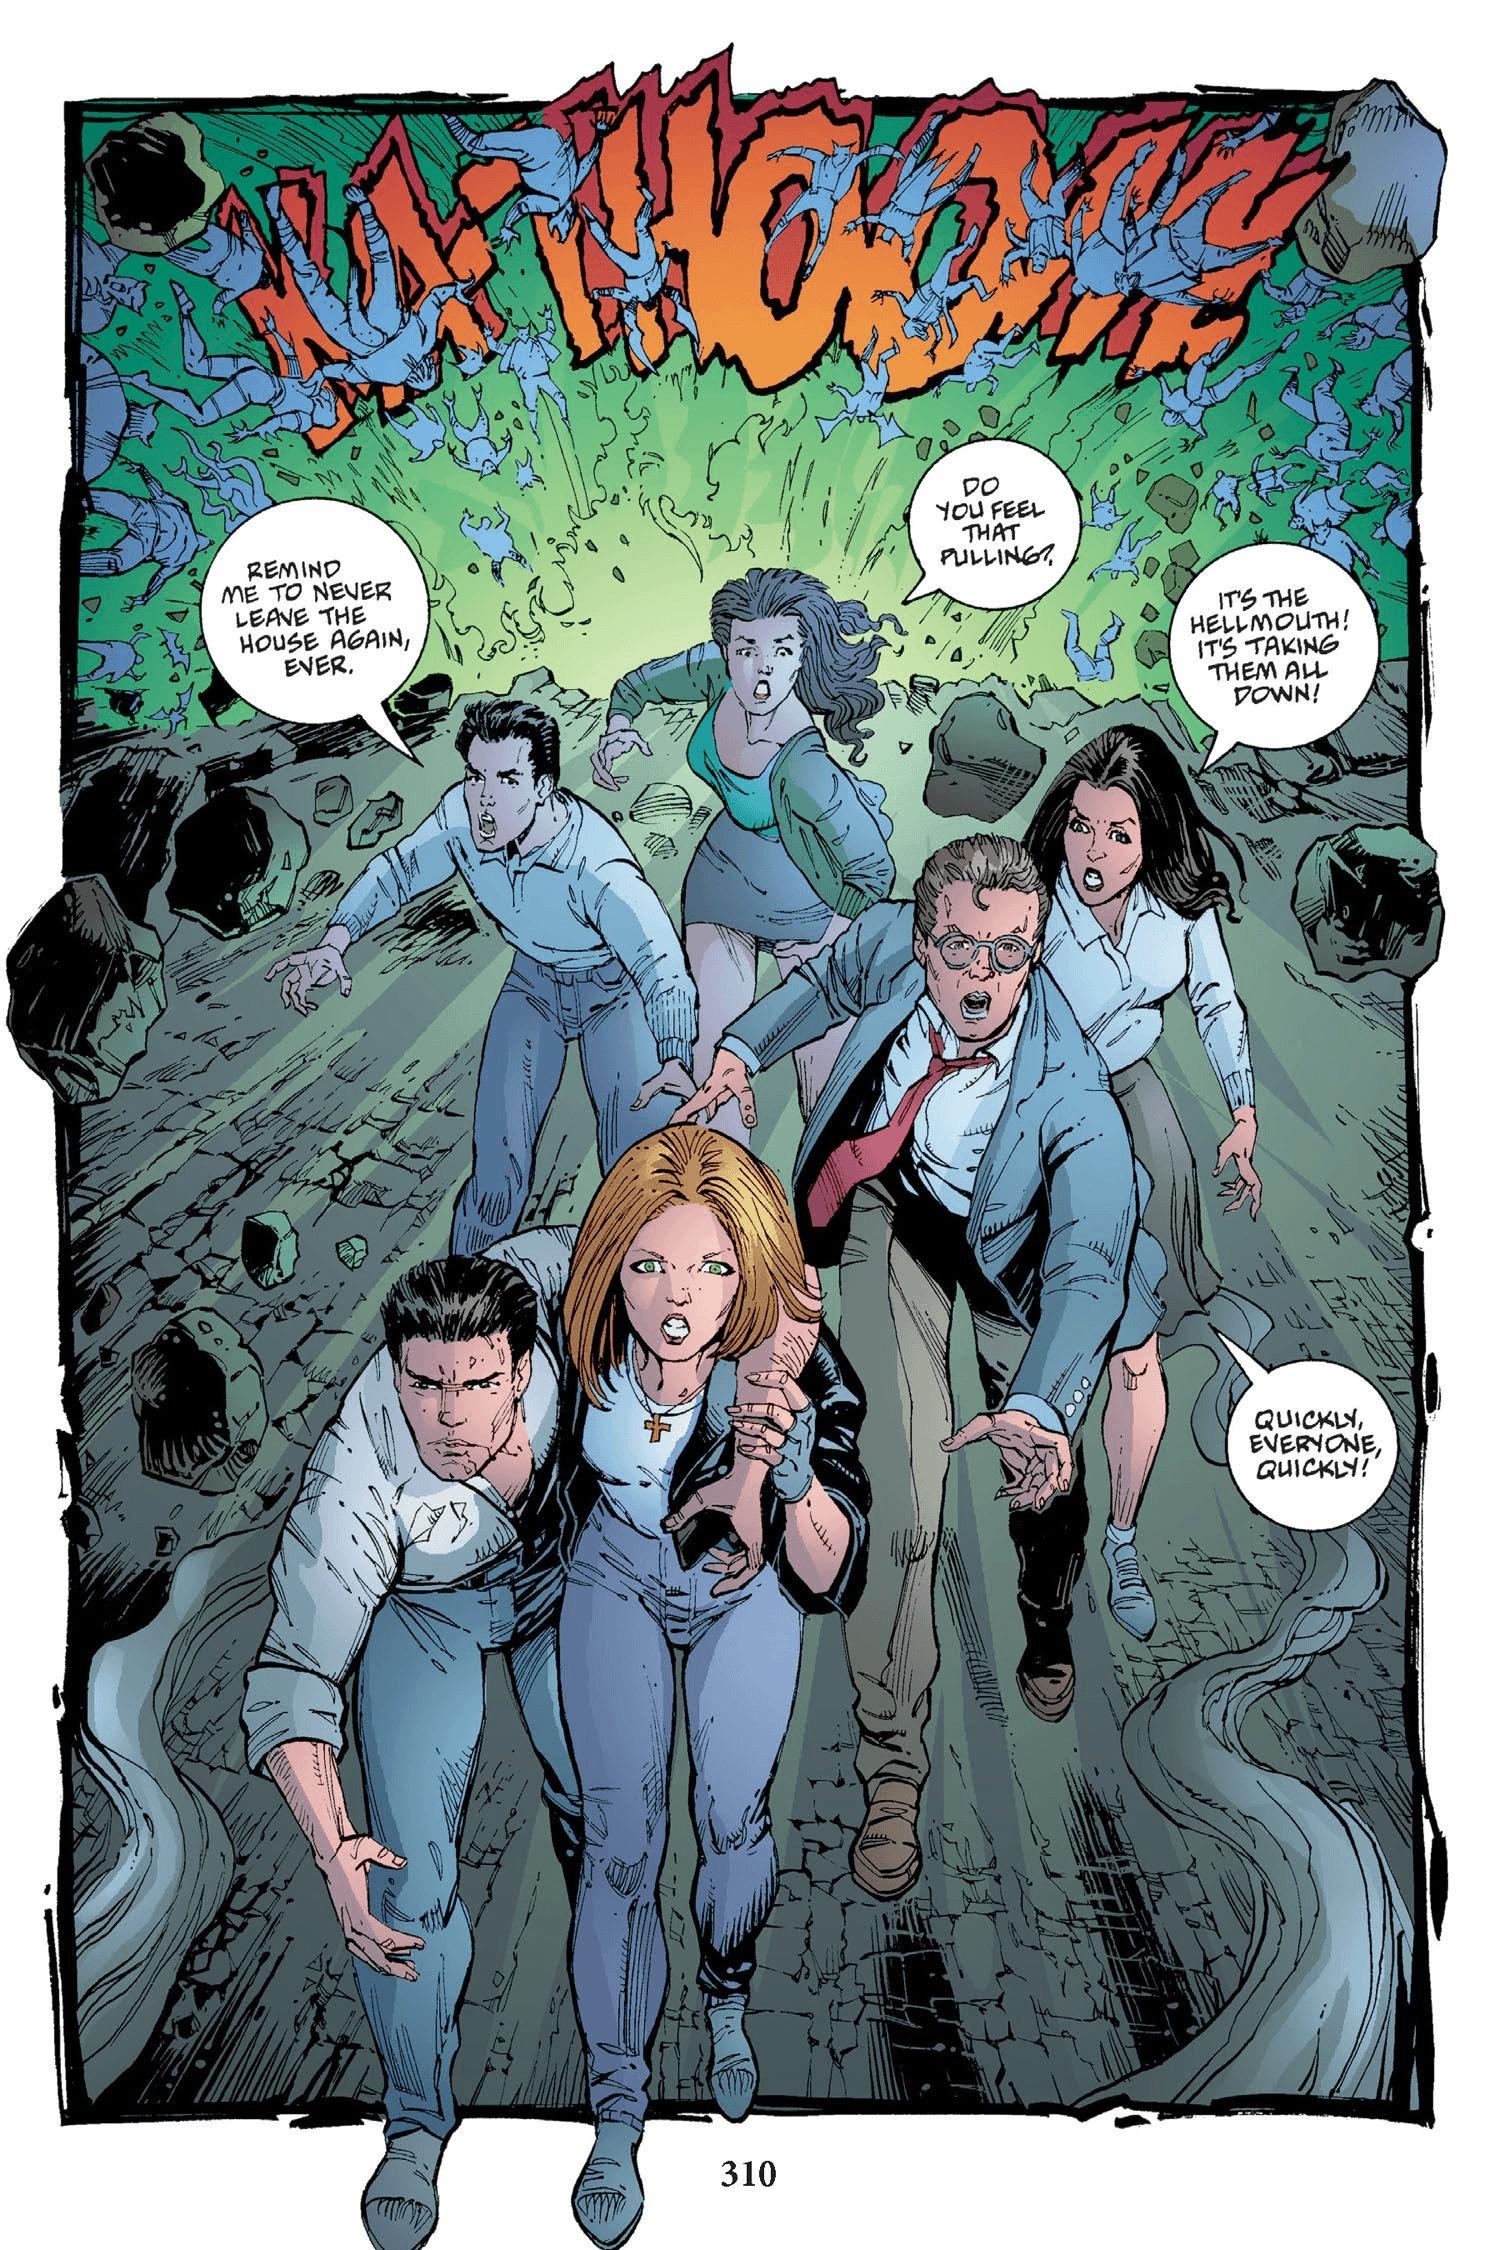 Read online Buffy the Vampire Slayer: Omnibus comic -  Issue # TPB 2 - 302